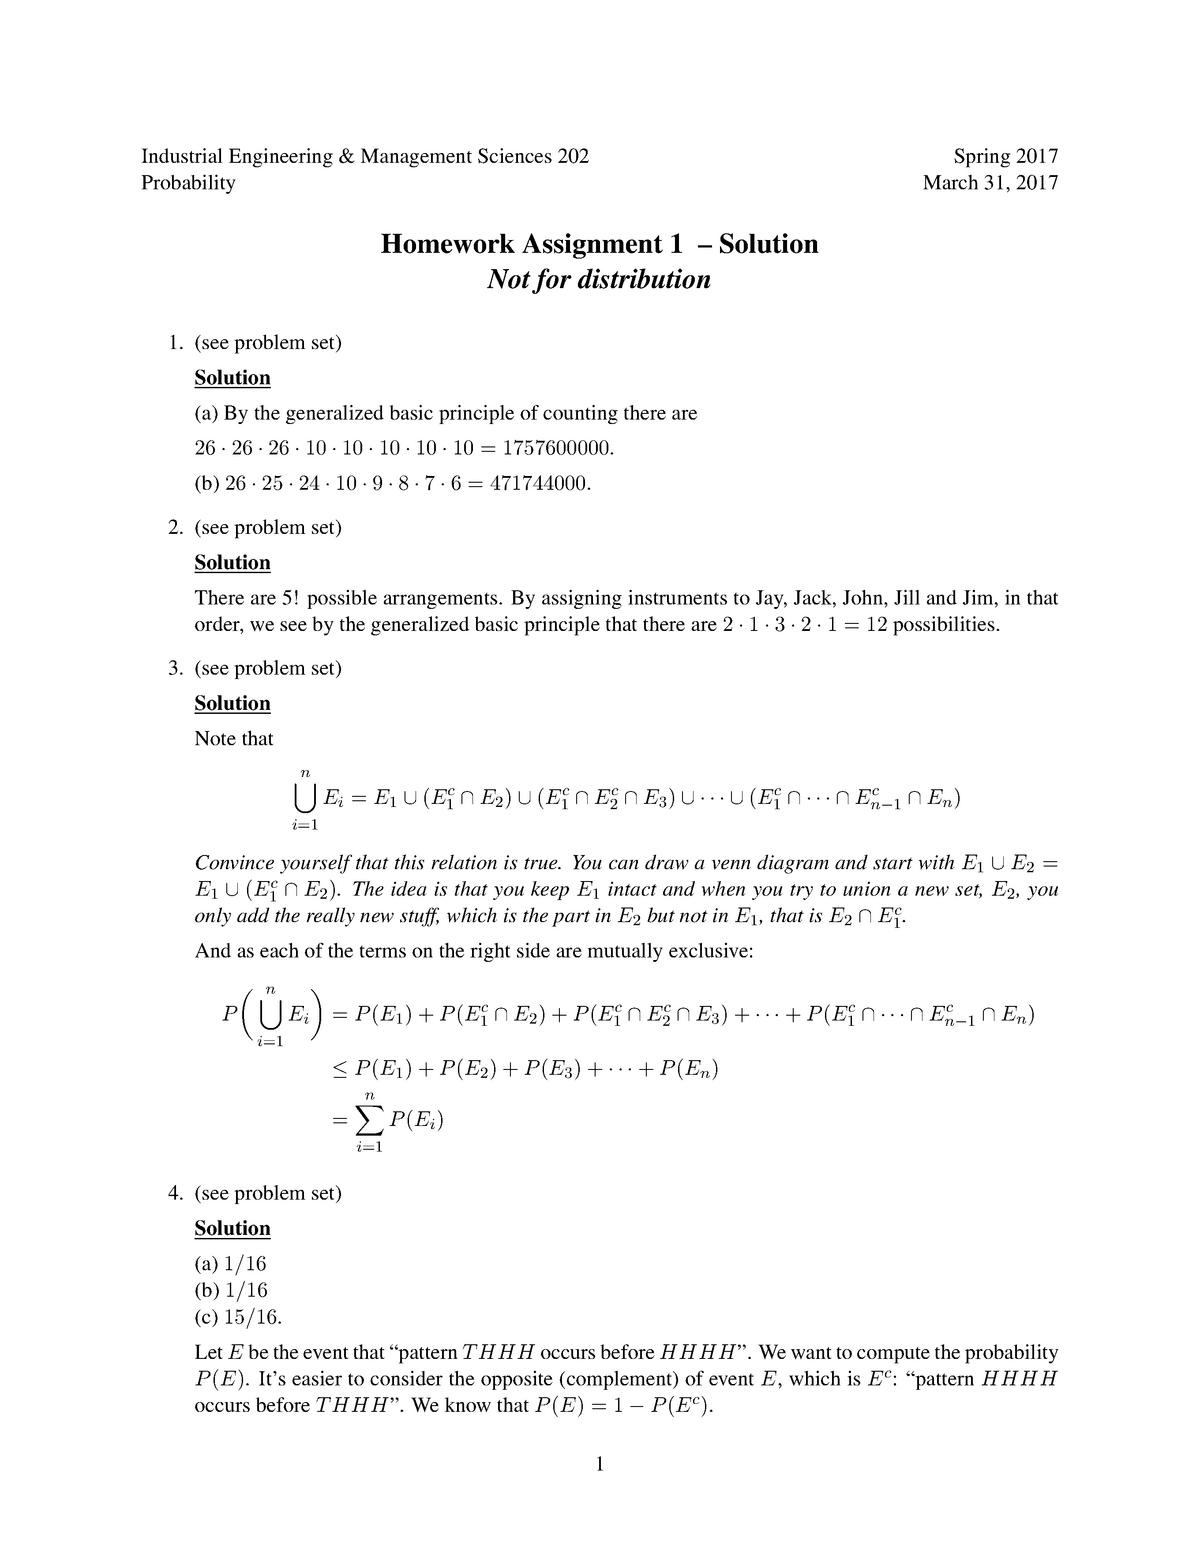 HW1 Sp17 solutions - IEMS 202: Probability - StuDocu